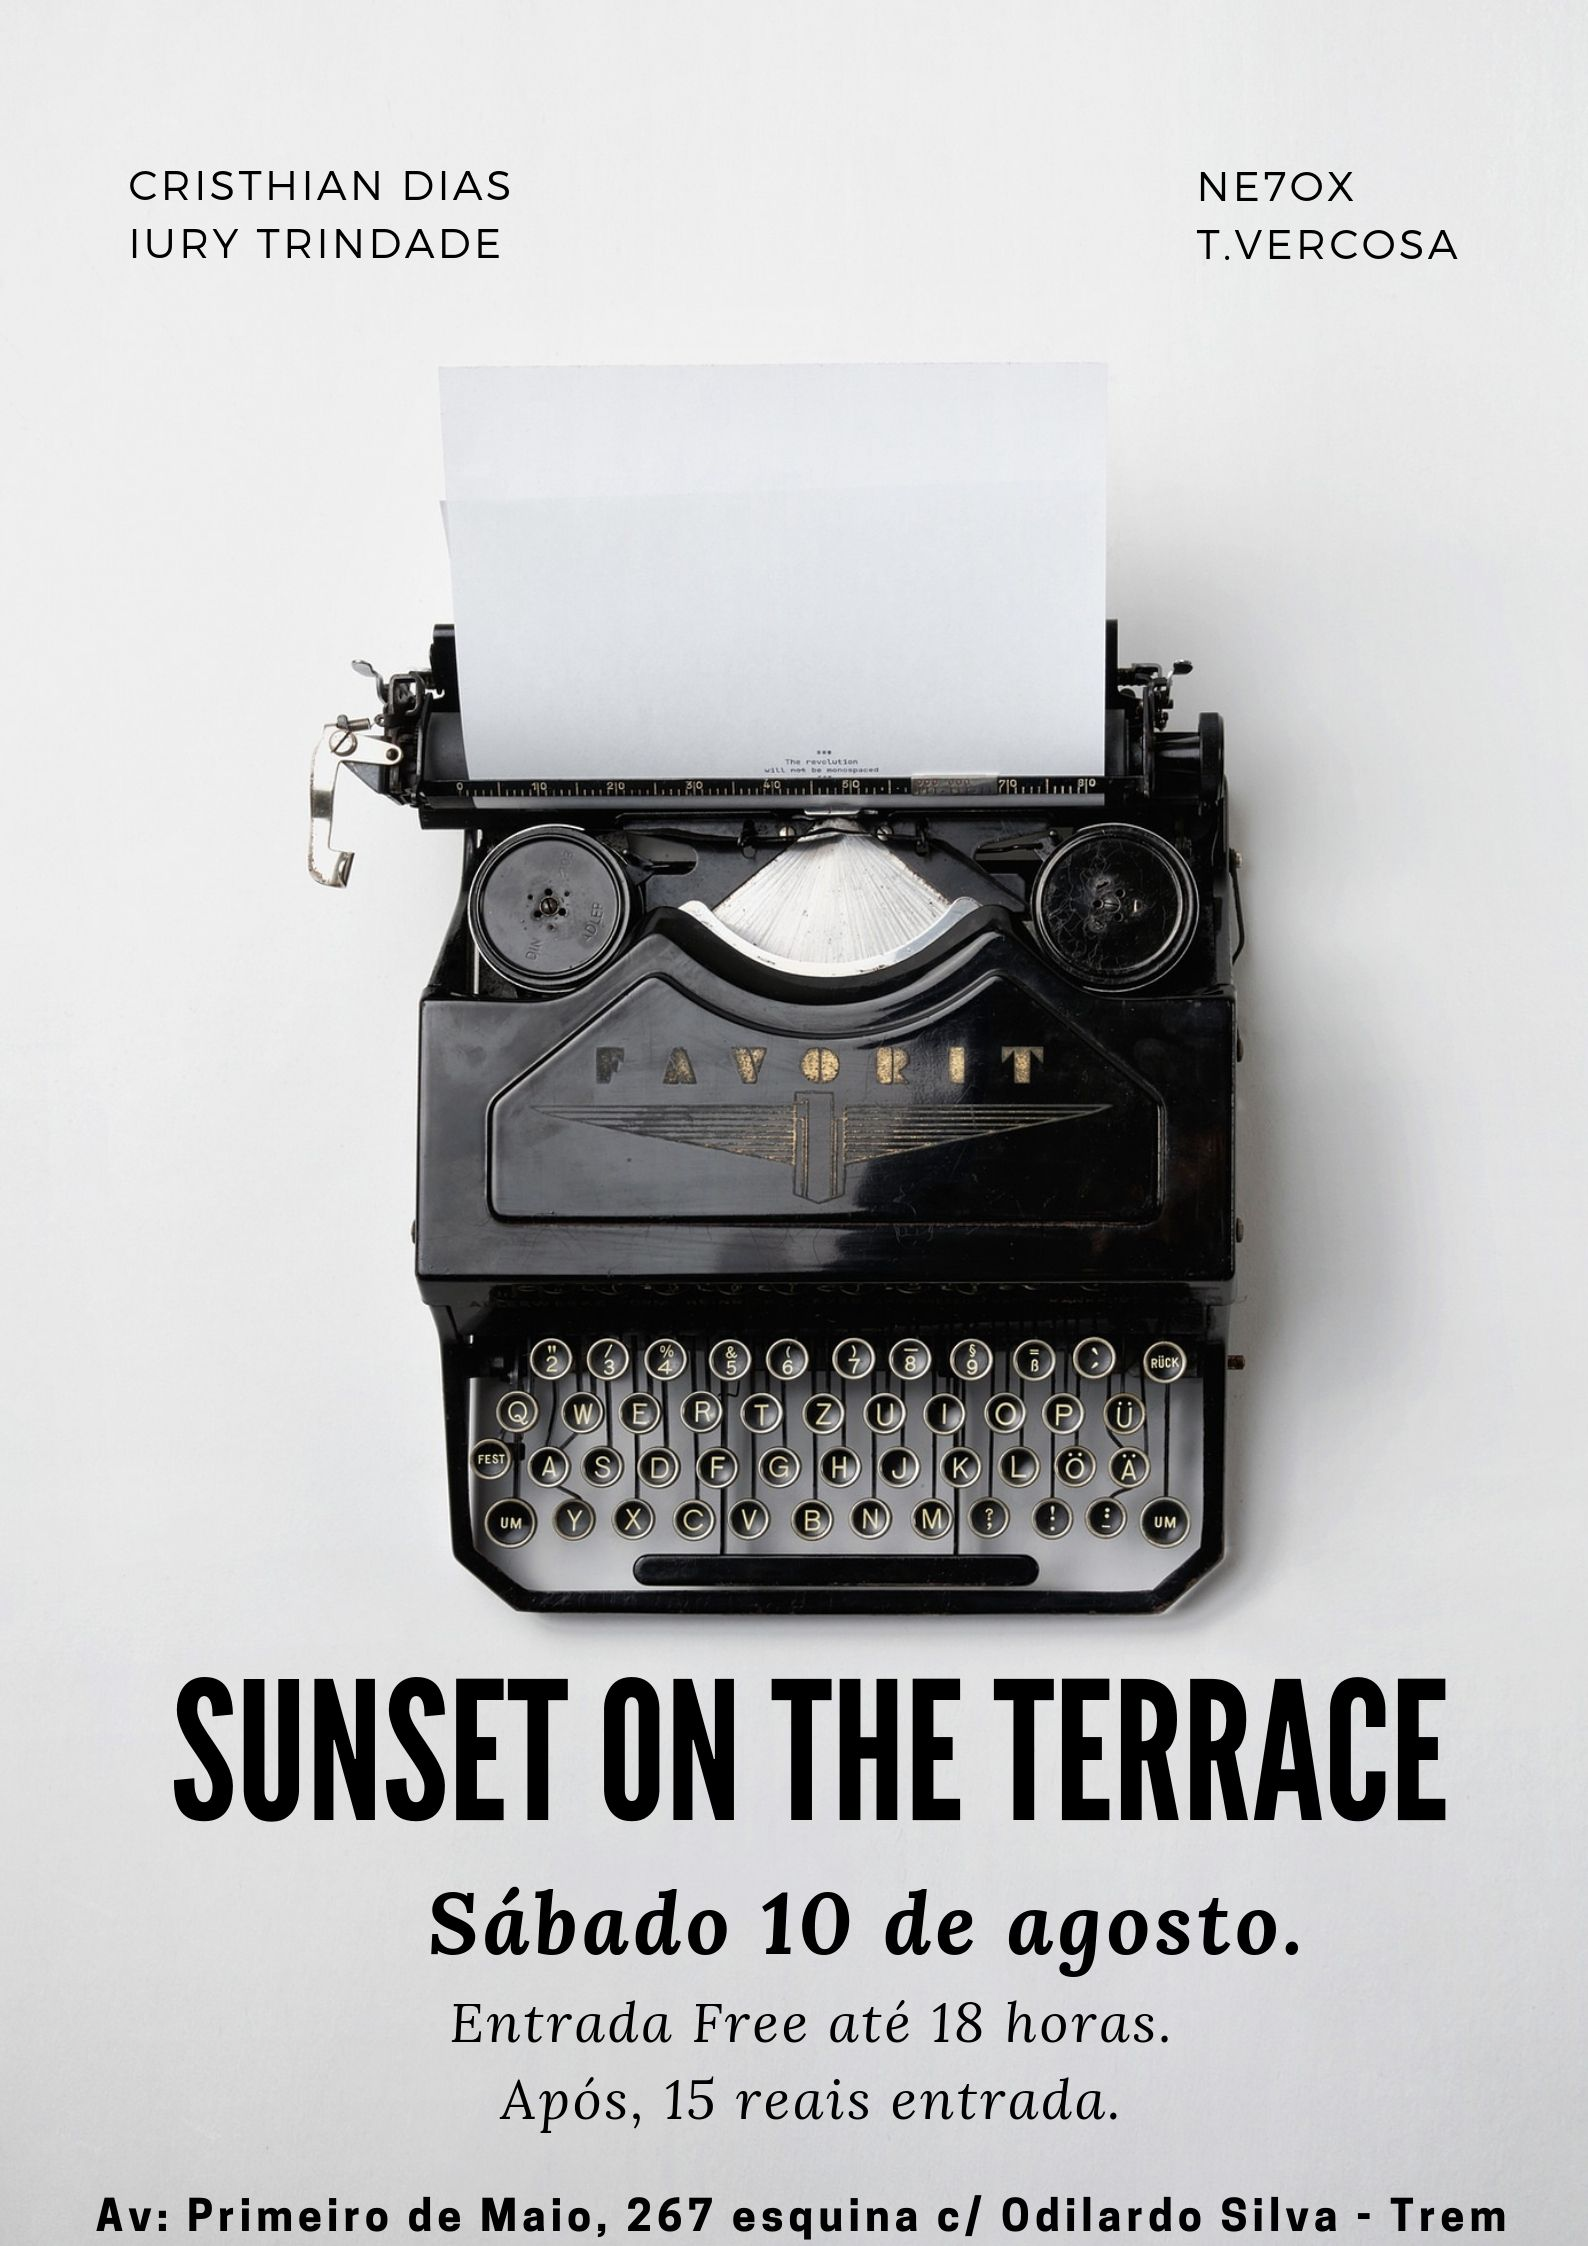 Sunset on the terrace 10_08_2019